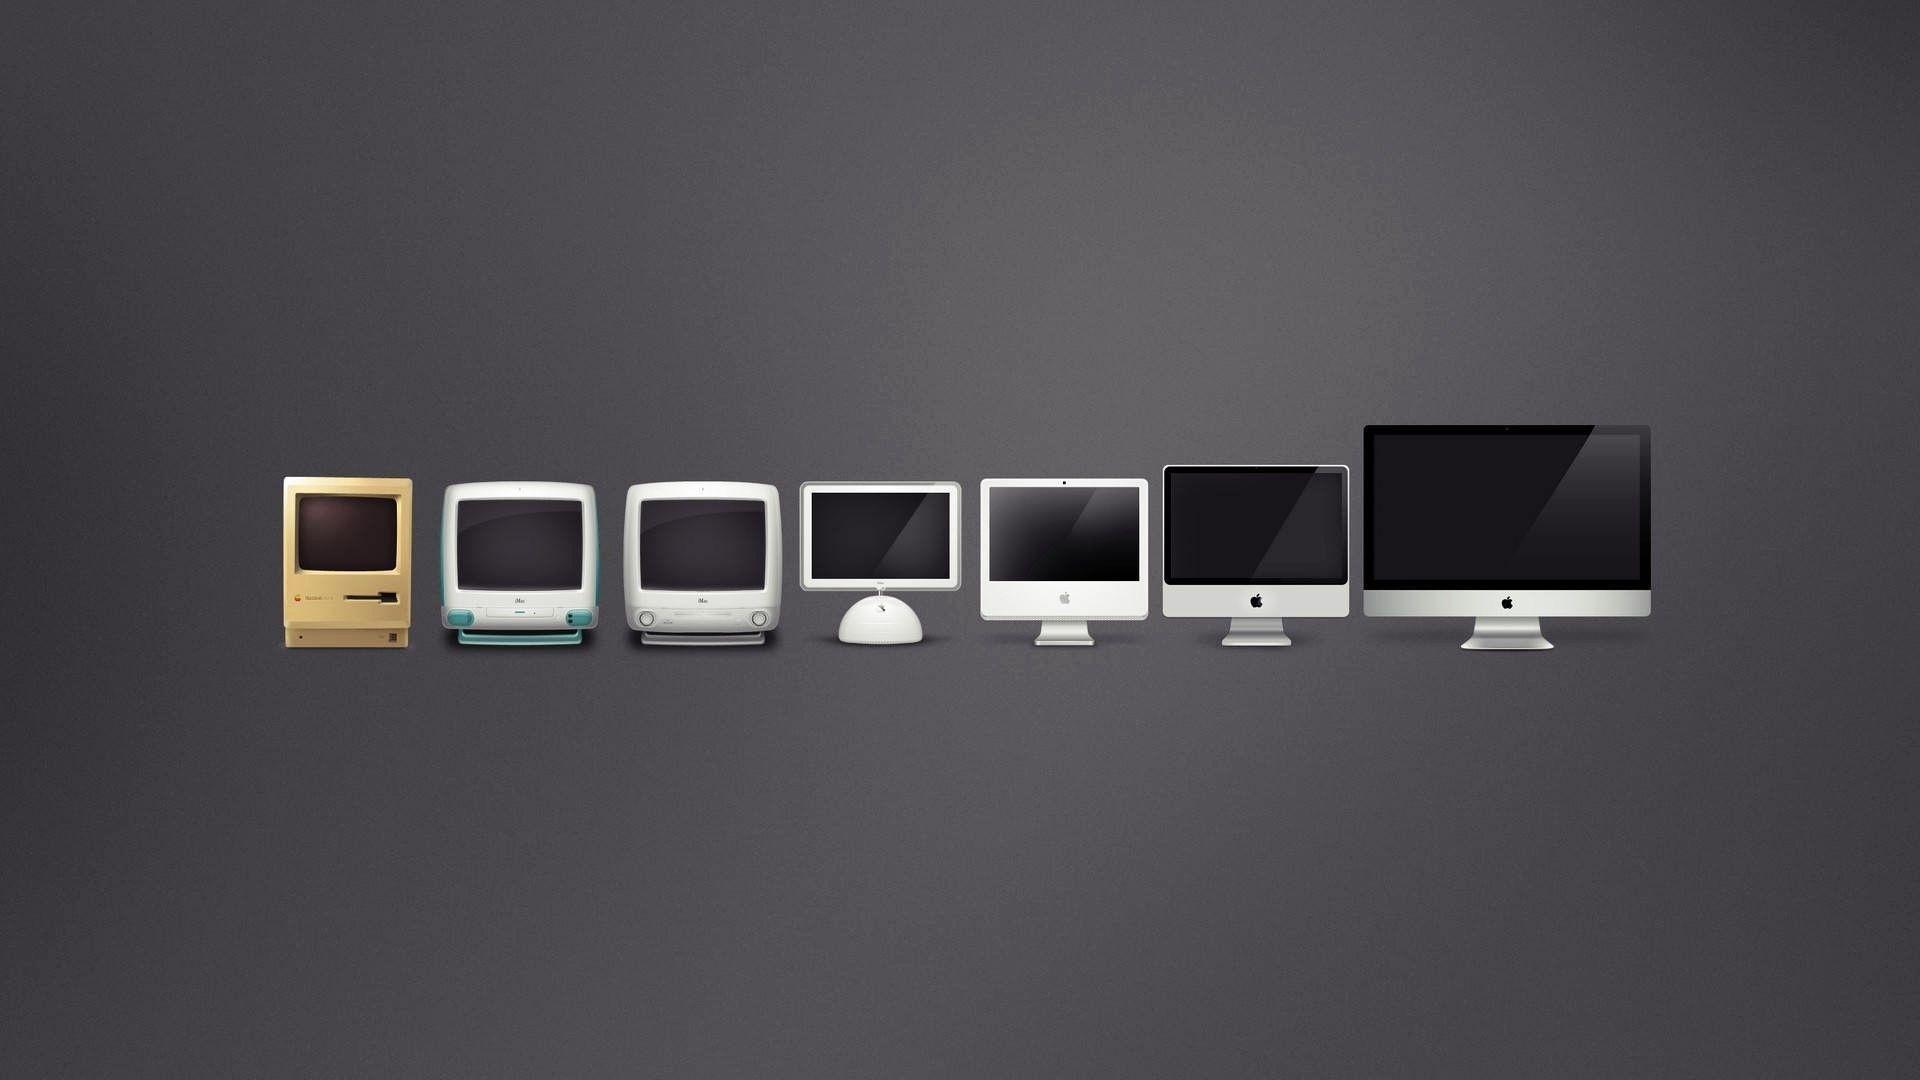 1920x1080 Mac Apple Computers 1080p Laptop Full Hd